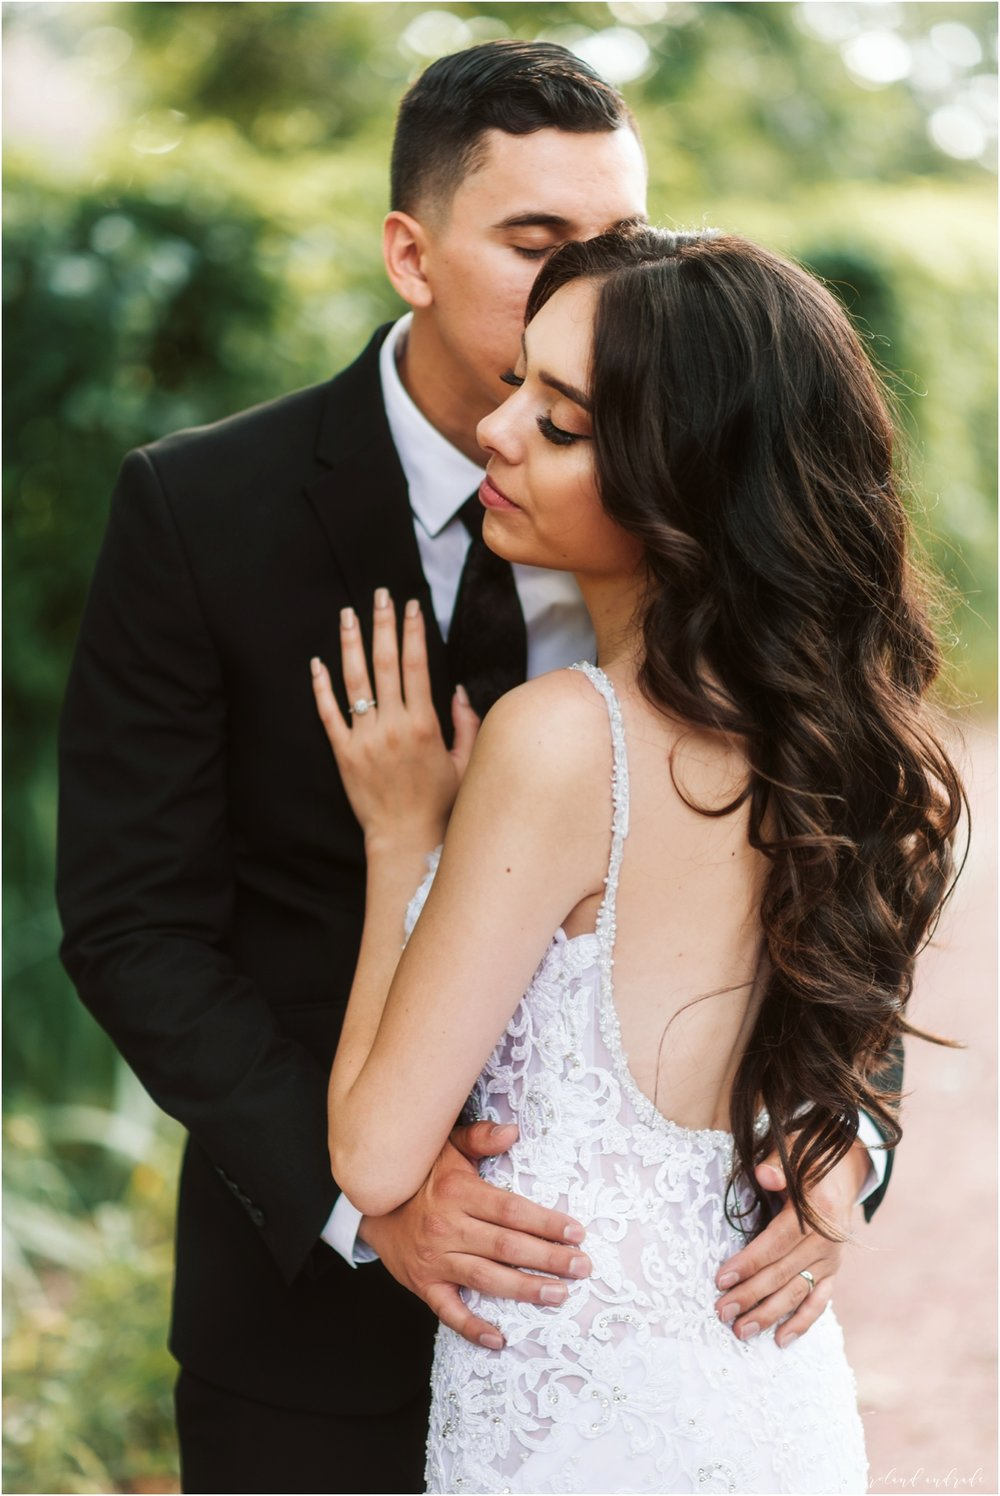 Danada House Wedding Photography Wheaton Illinois - Chicago Wedding Photography_0065.jpg